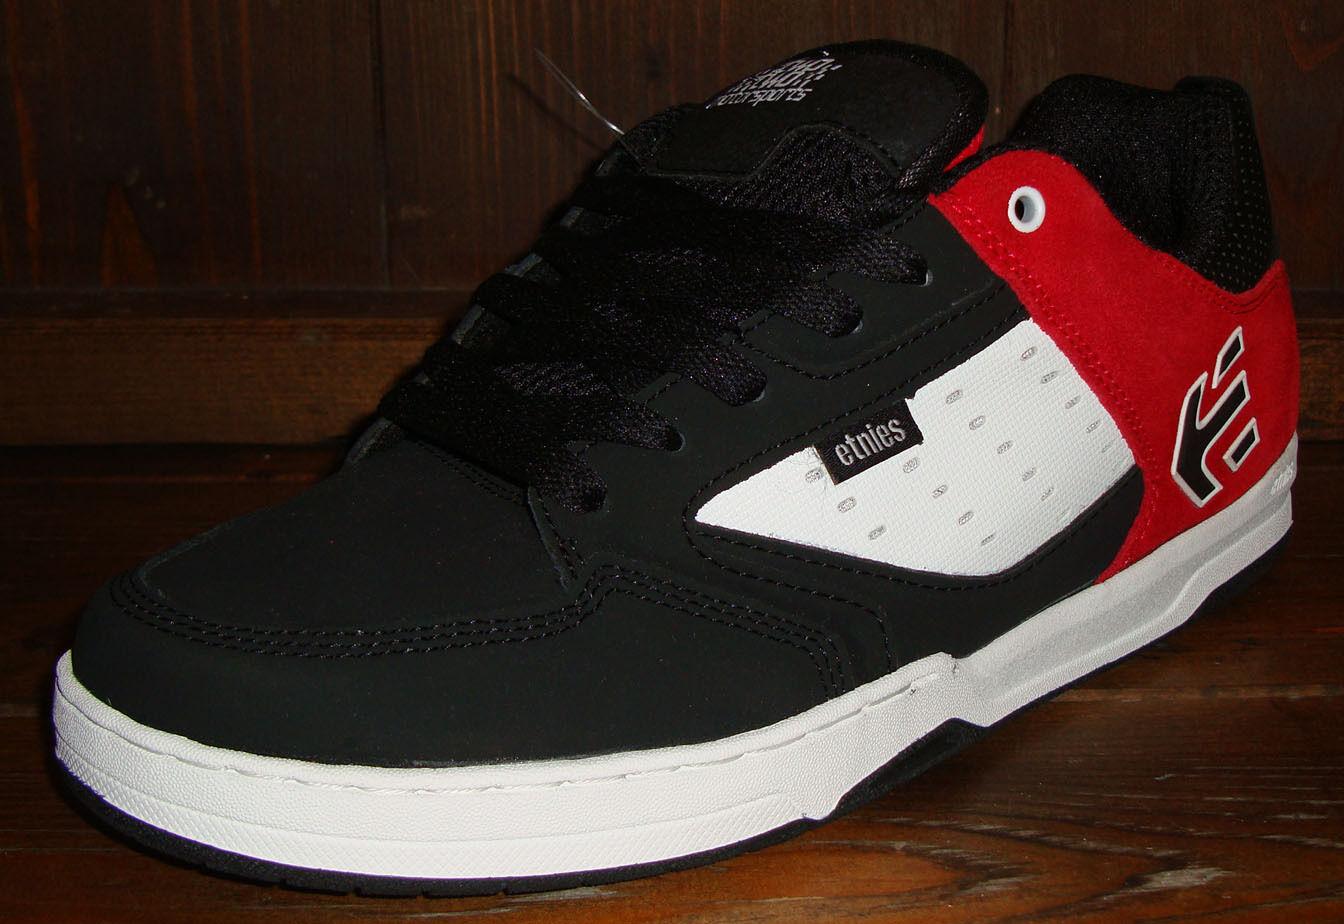 Schuhe da skateboard ETNIES Chad Cartel reed Cartel Chad men's skate street Turnschuhe schuhe 7c517c